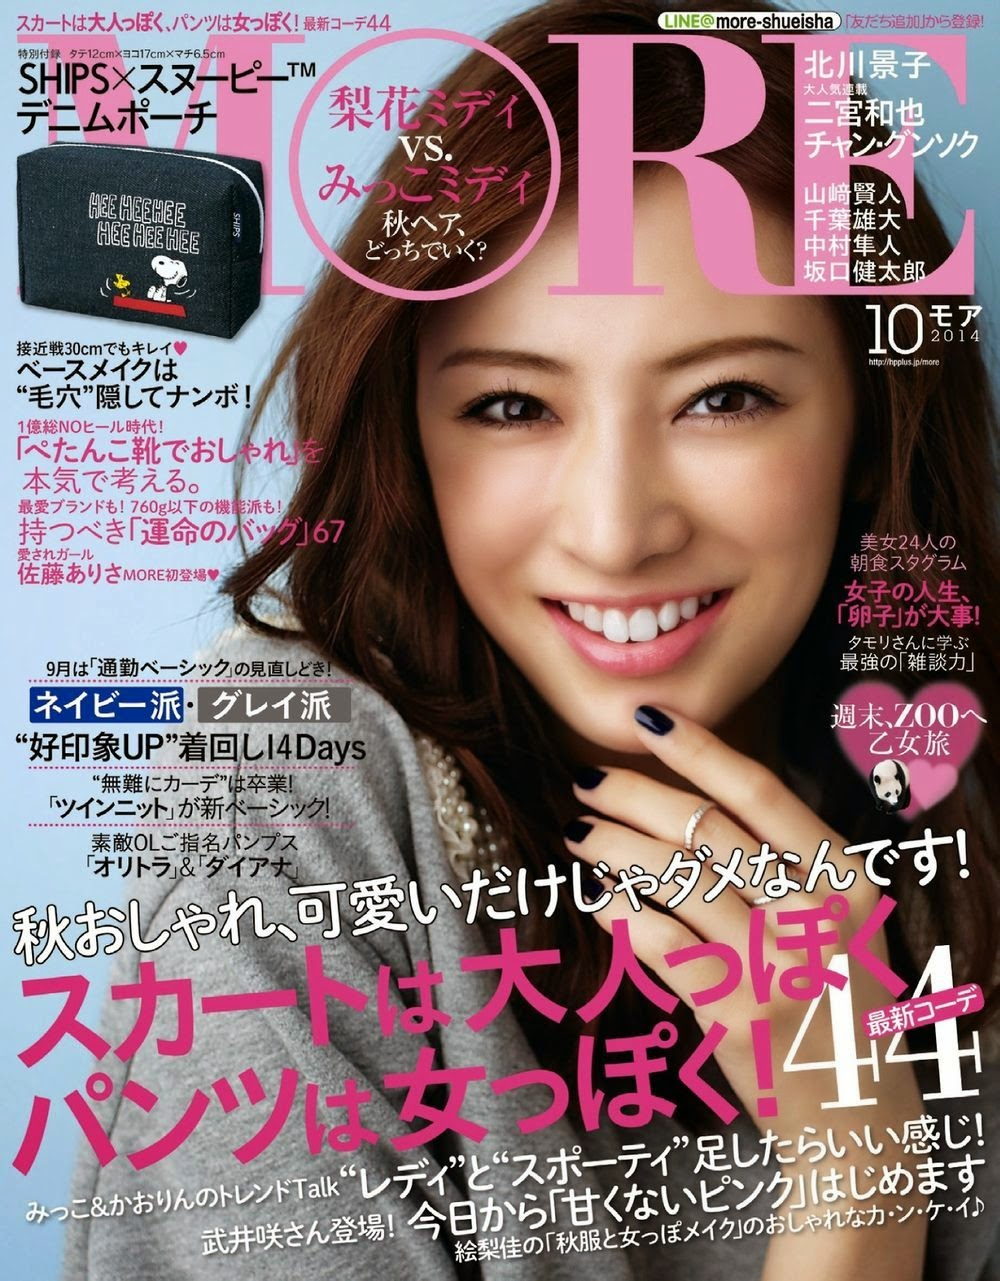 Keiko Kitagawa Nude Delightful nao kanzaki and a few friends: keiko kitagawa: 2014 magazine scans #2